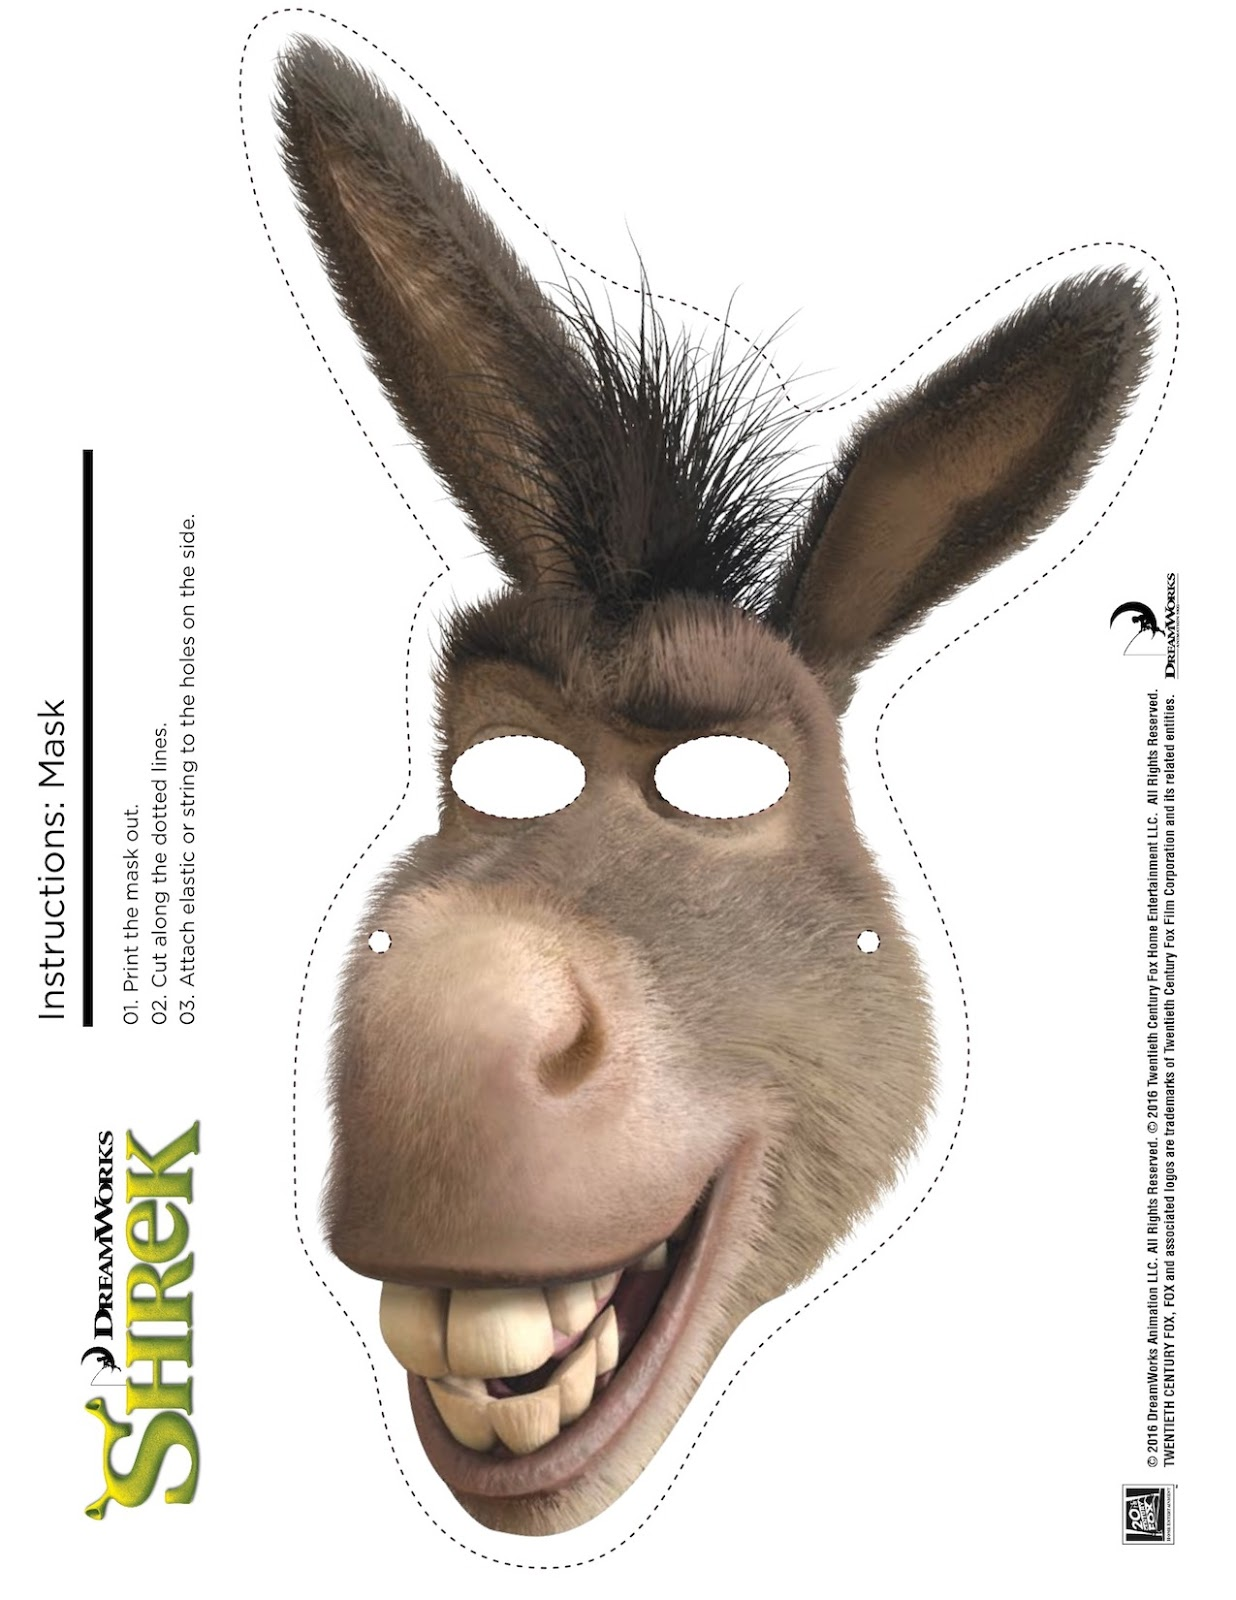 Shrek Photo Booth Props + Print Free Printable Shrek Mask